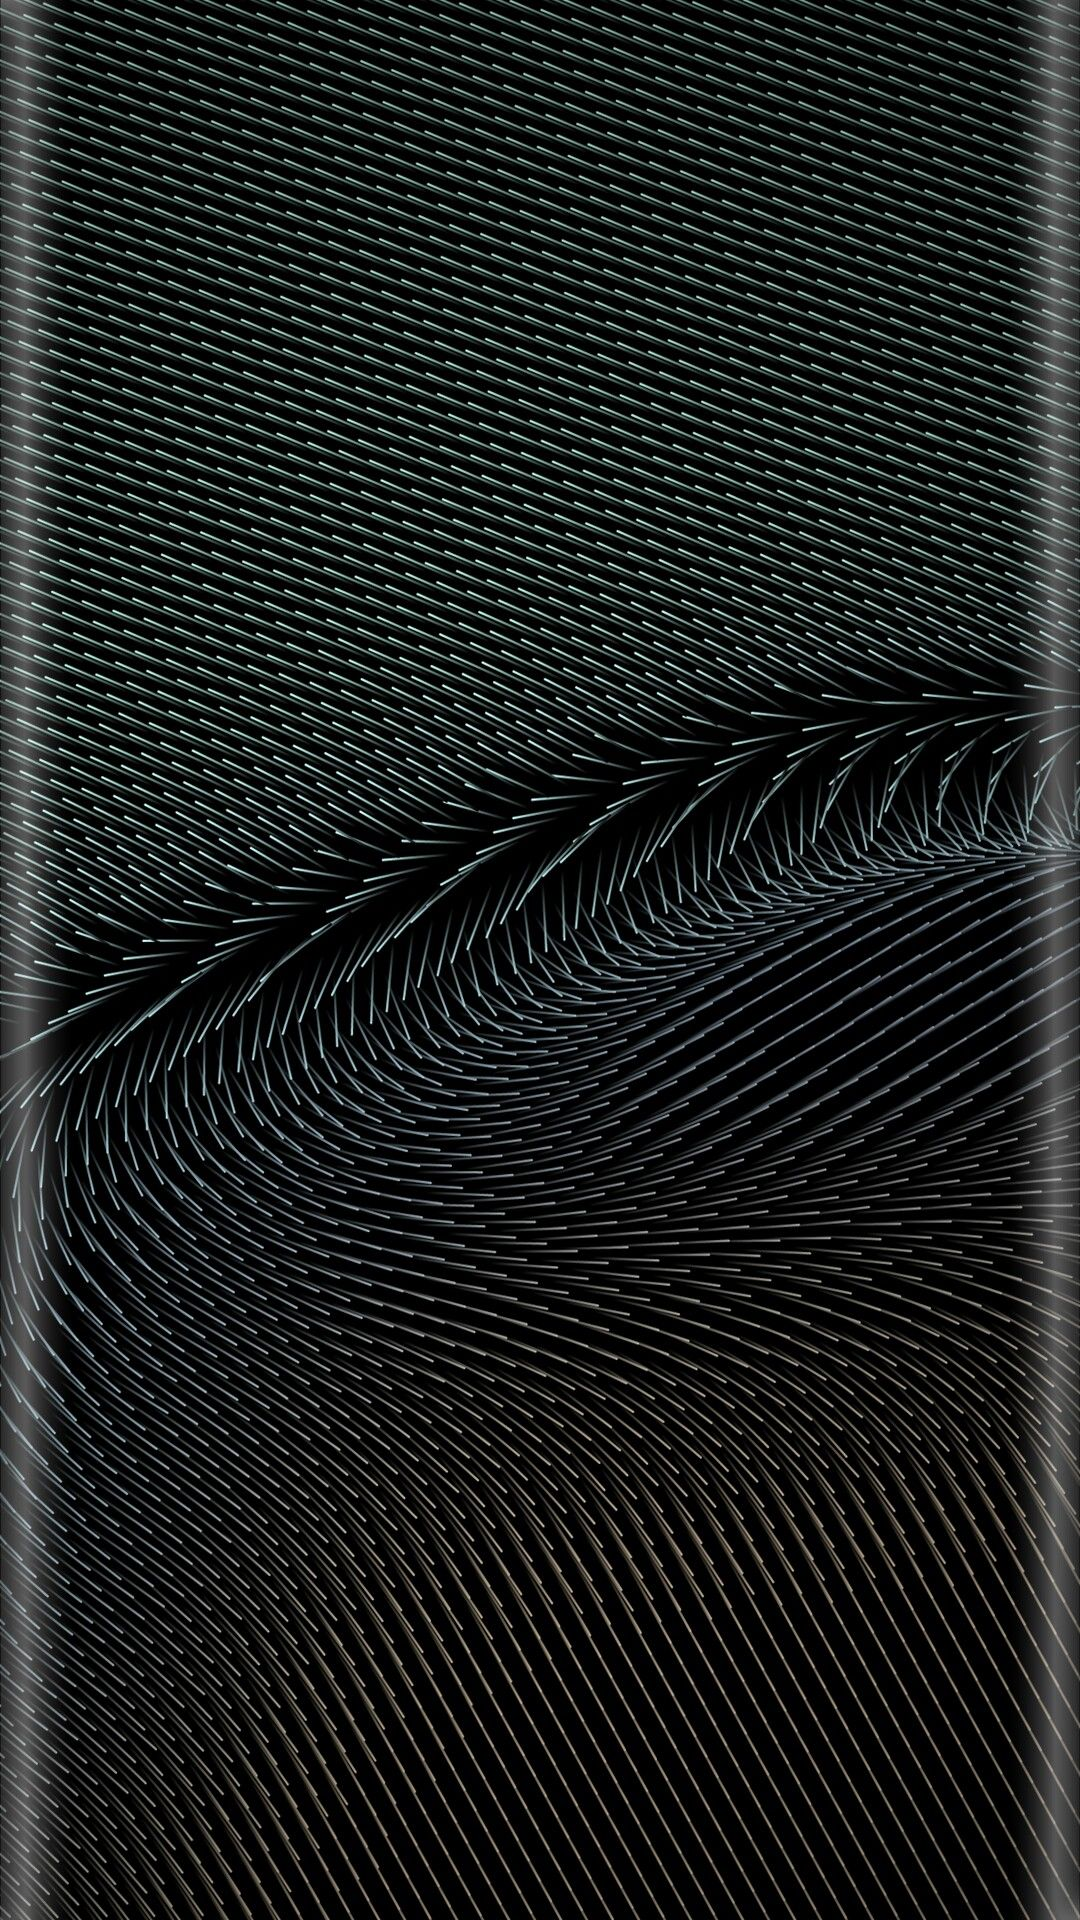 S6 Edge Samsung Wallpaper S8 Wallpaper Apple Wallpaper